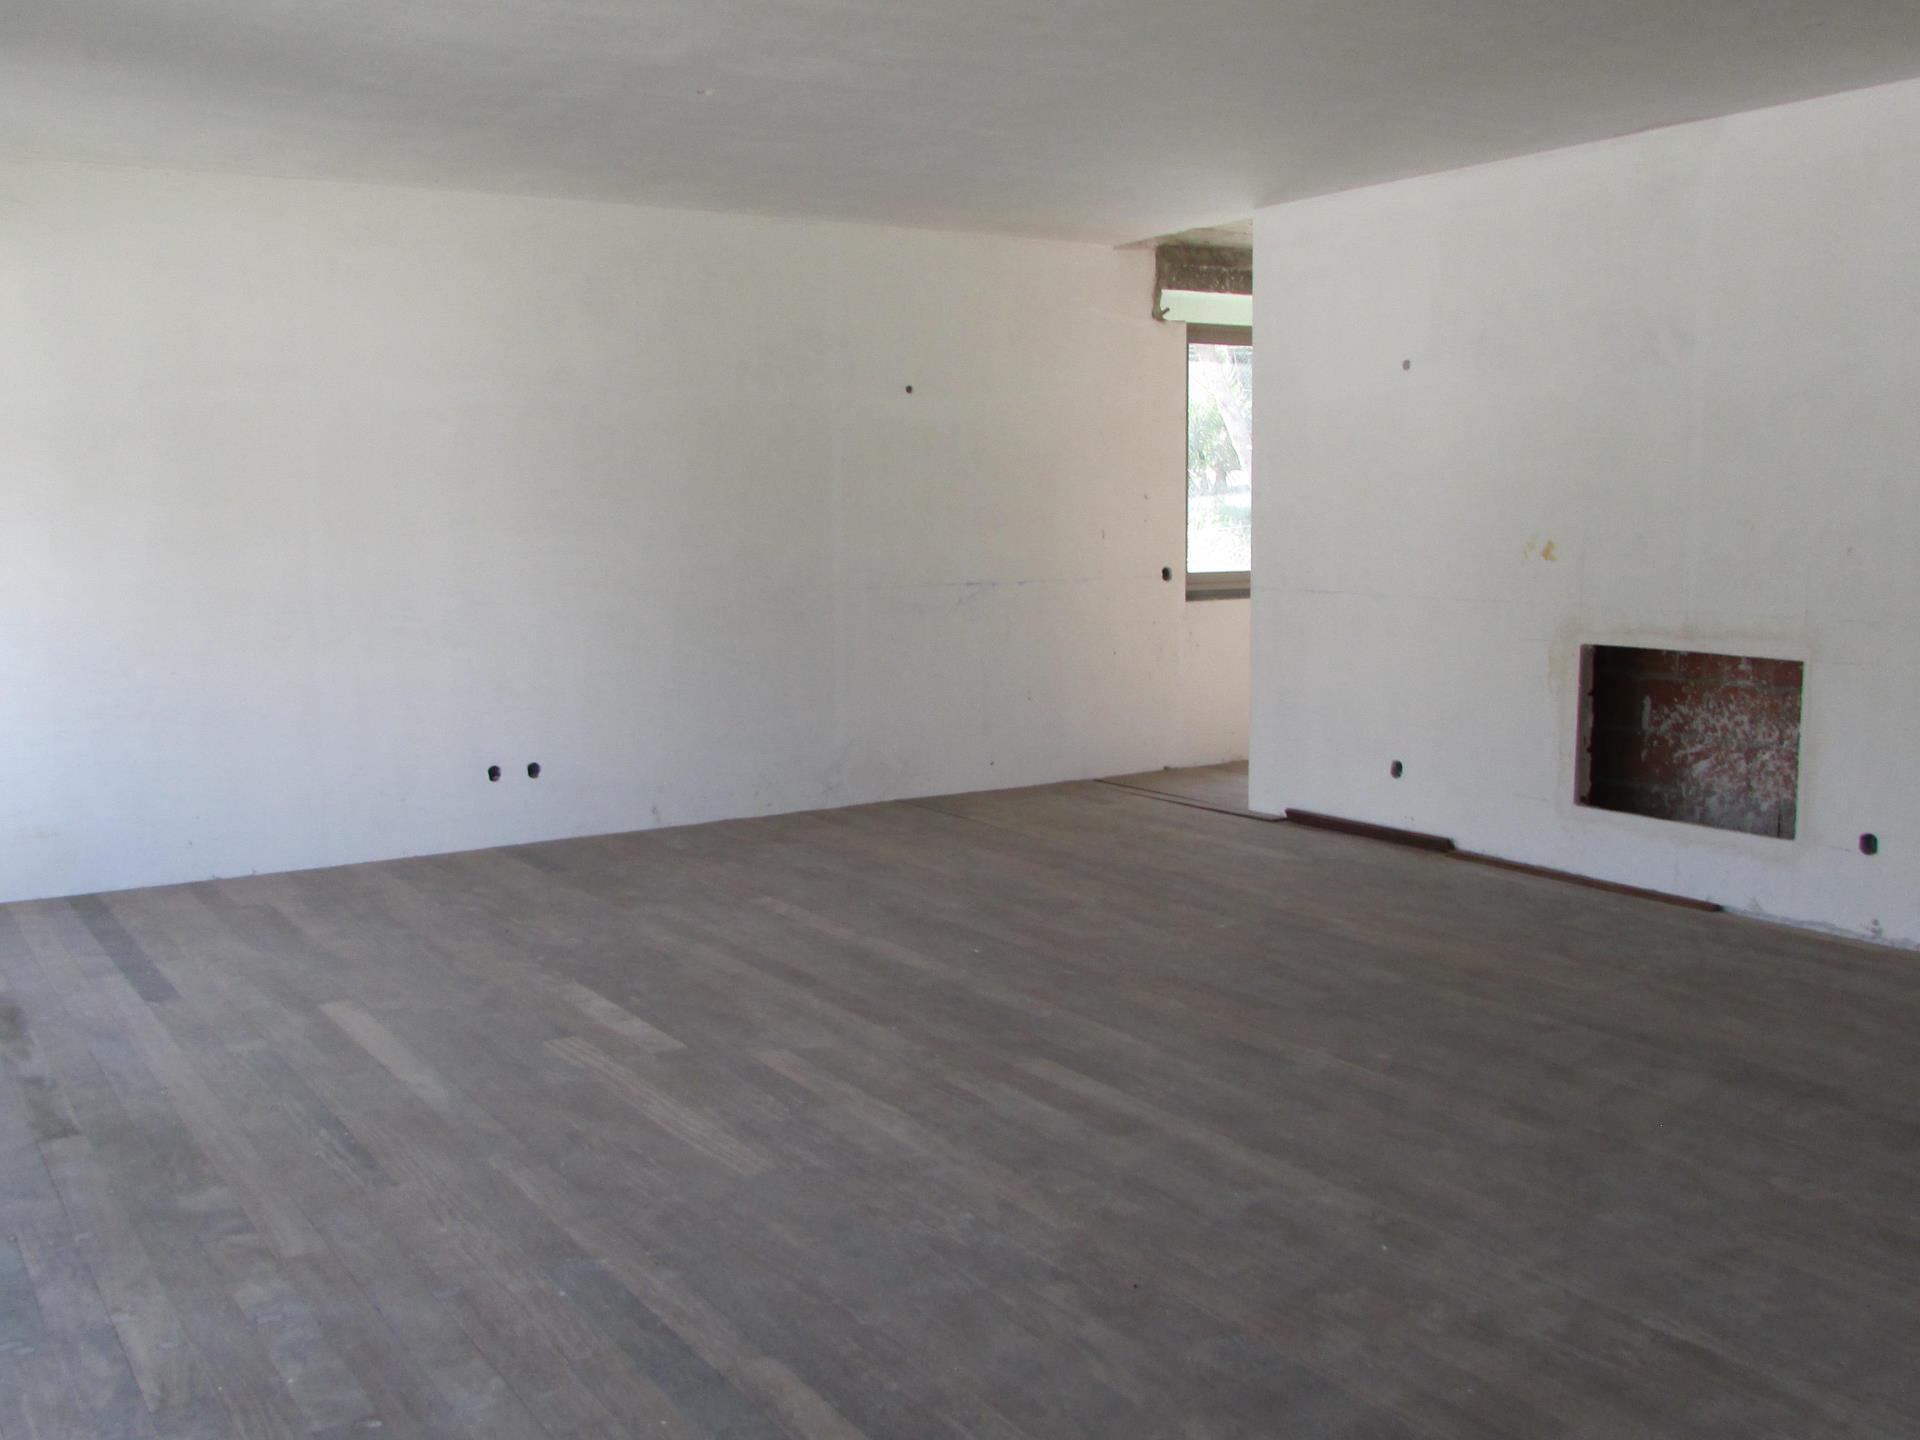 Tek Ailelik Ev için Satış at House, 3 bedrooms, for Sale Cobre, Cascais, Lisboa Portekiz